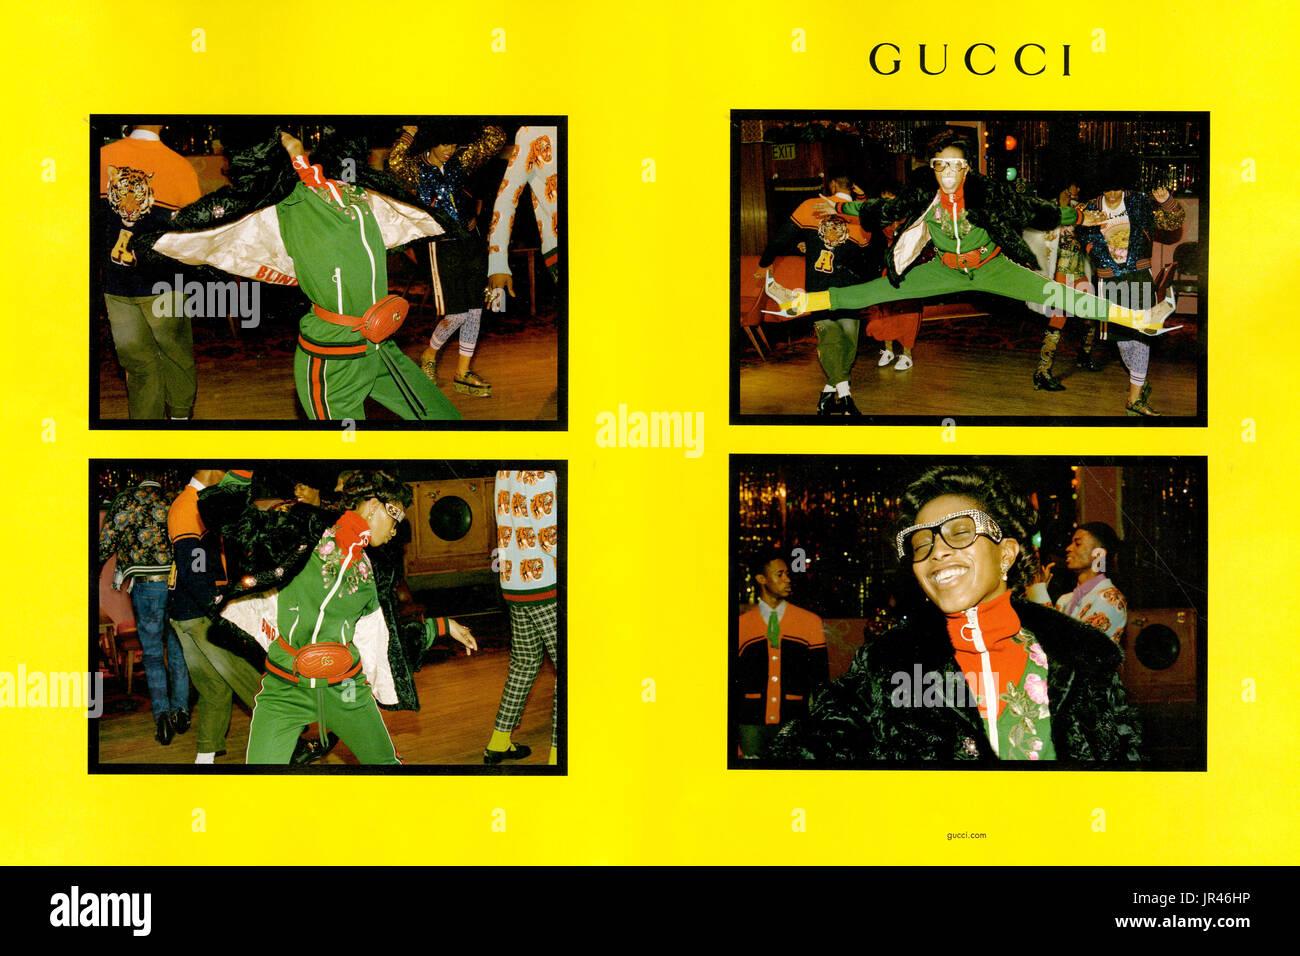 dbb31f98cbbc 2010er Jahre UK Gucci Magazin Anzeige Stockfoto, Bild  151913042 - Alamy